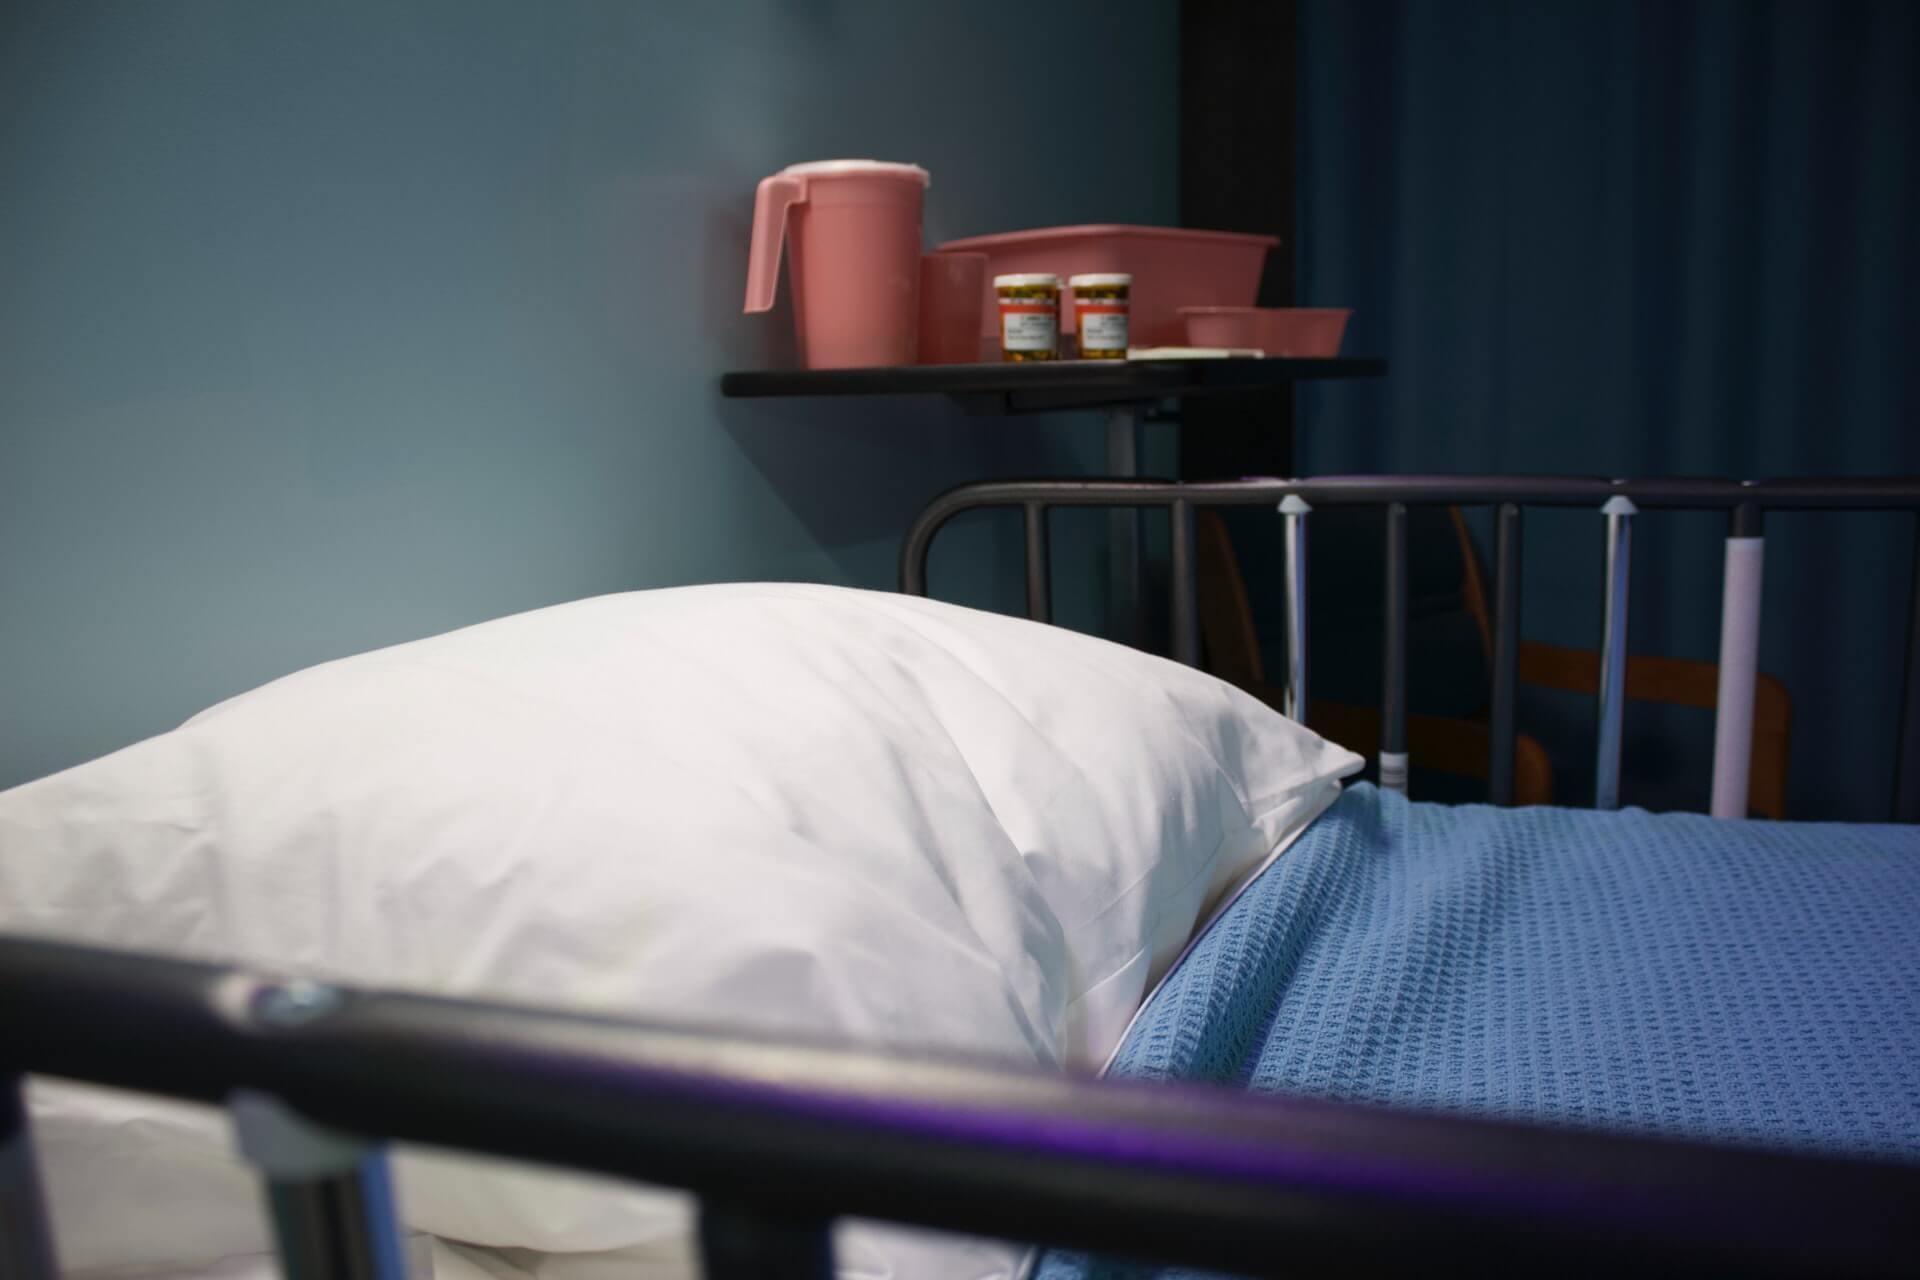 Hospital bed with medicine bottles on side table